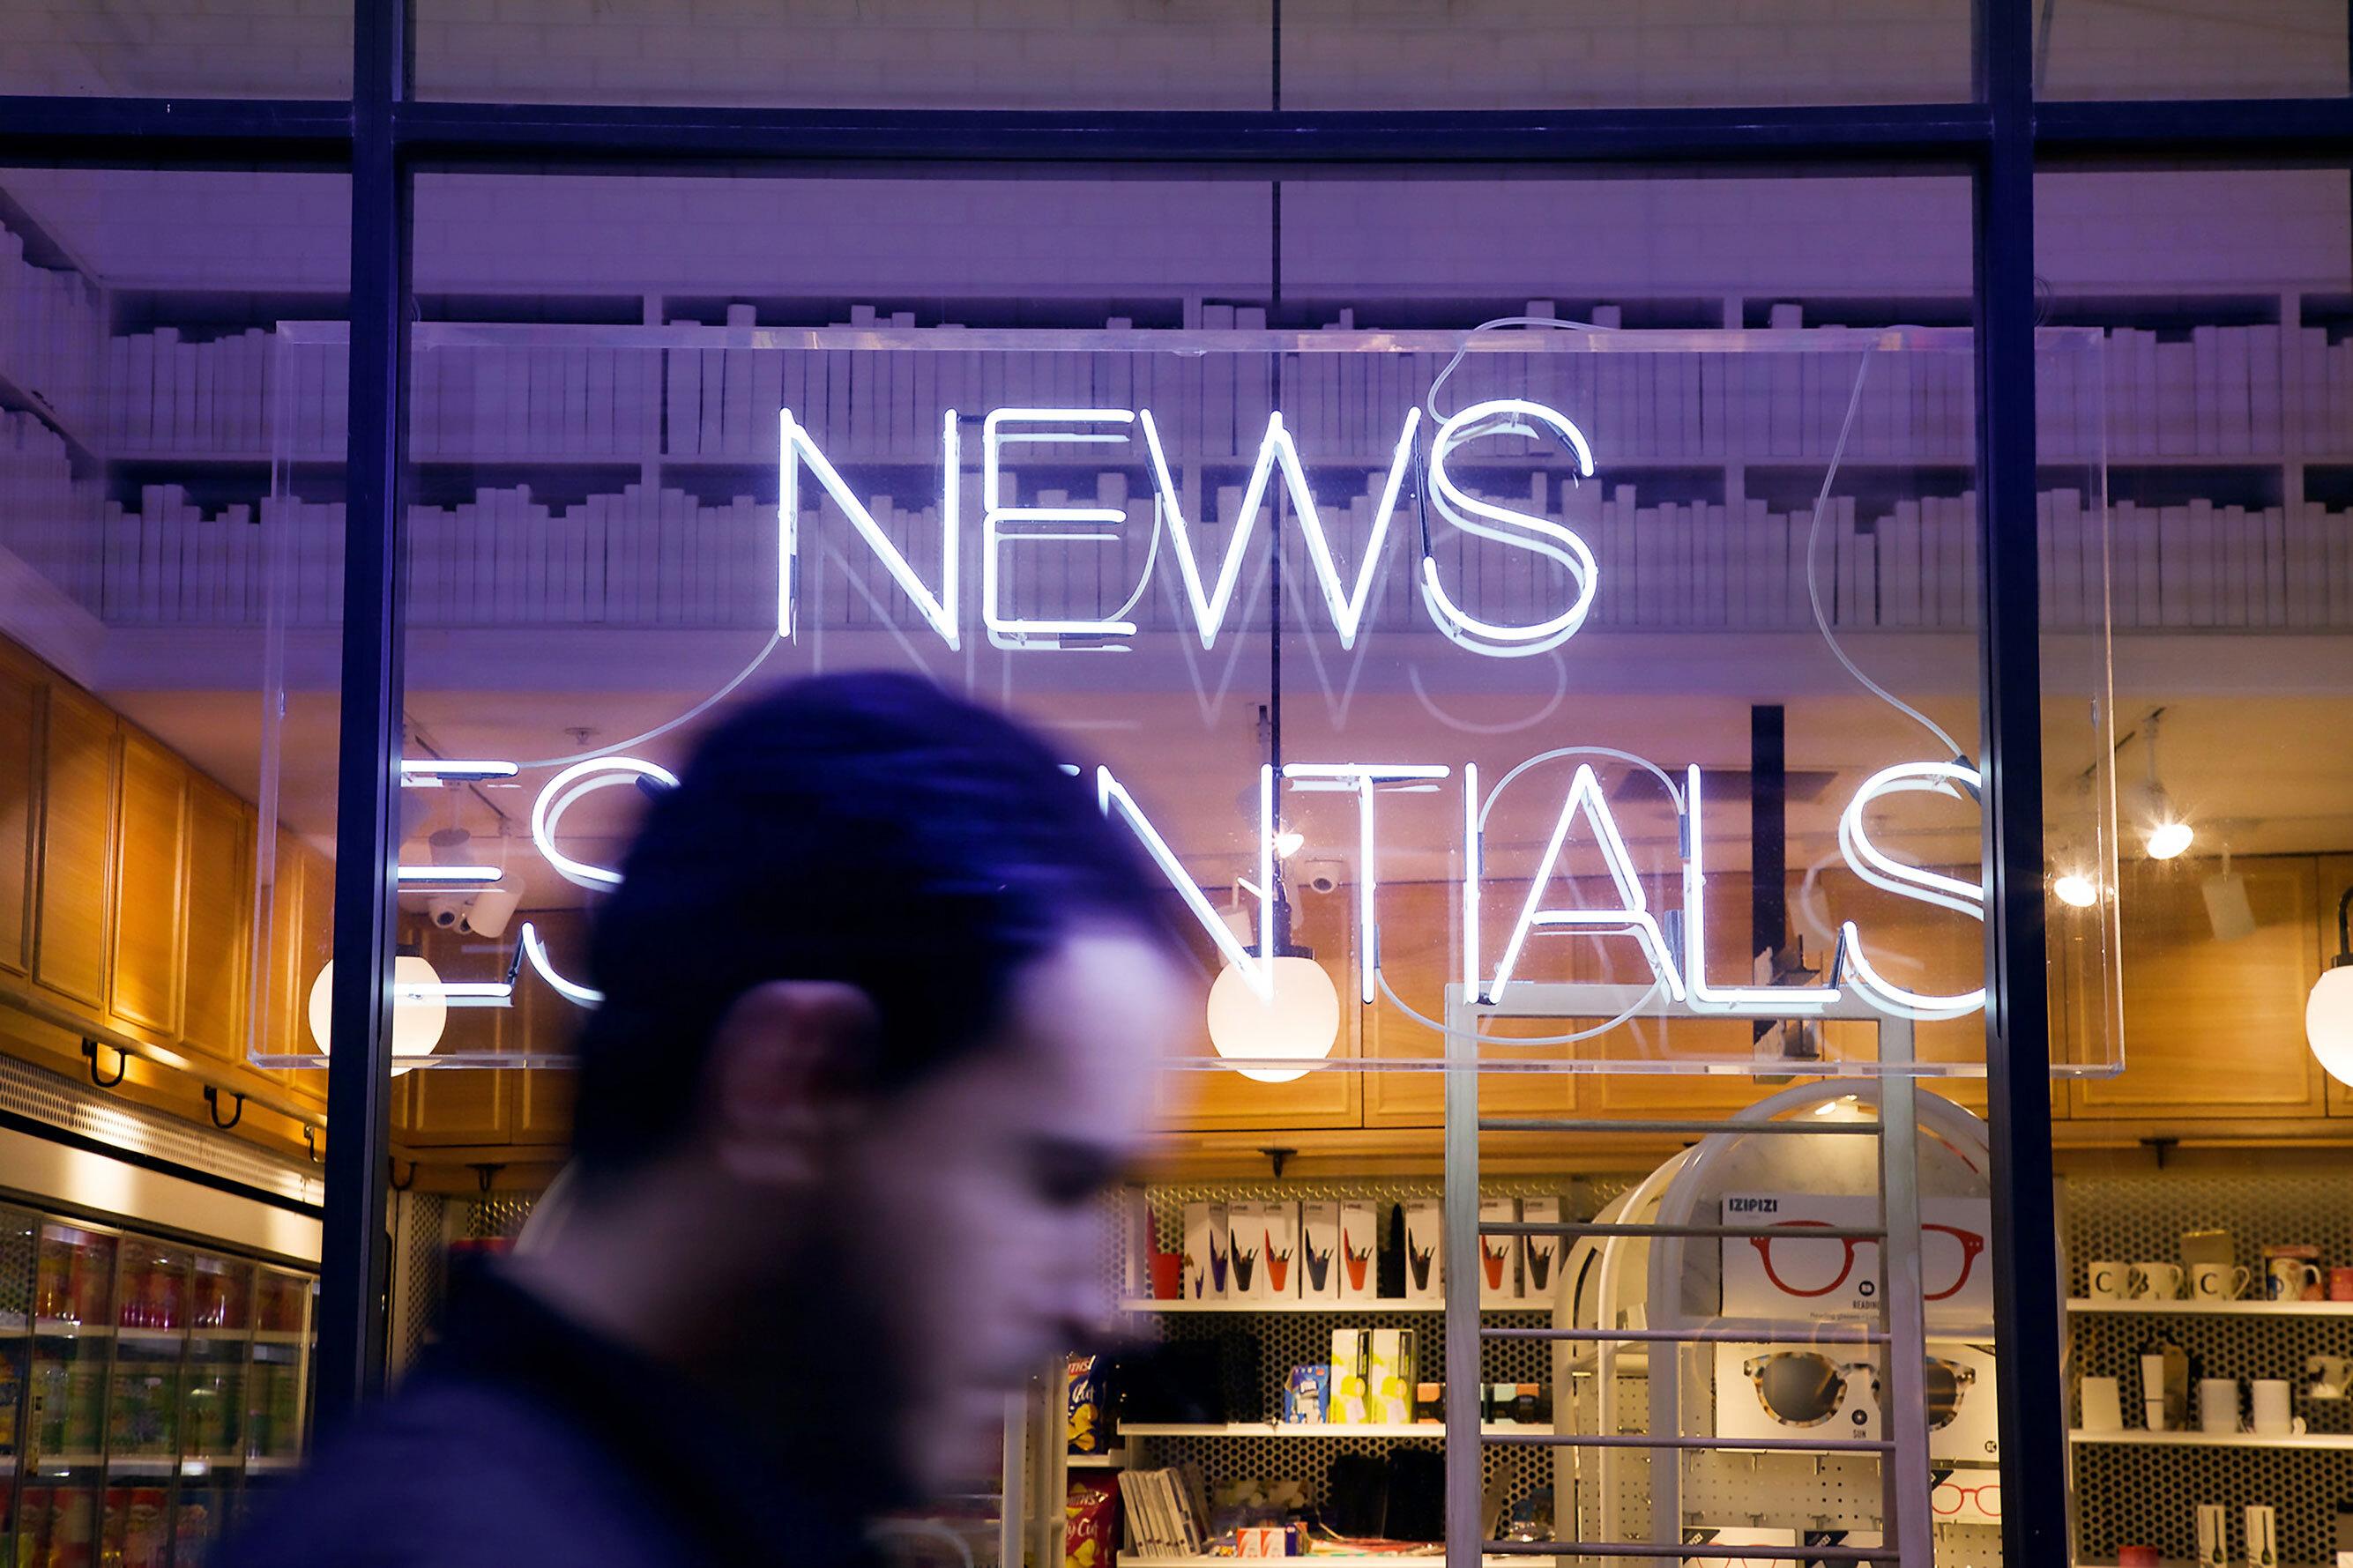 Neon news sign